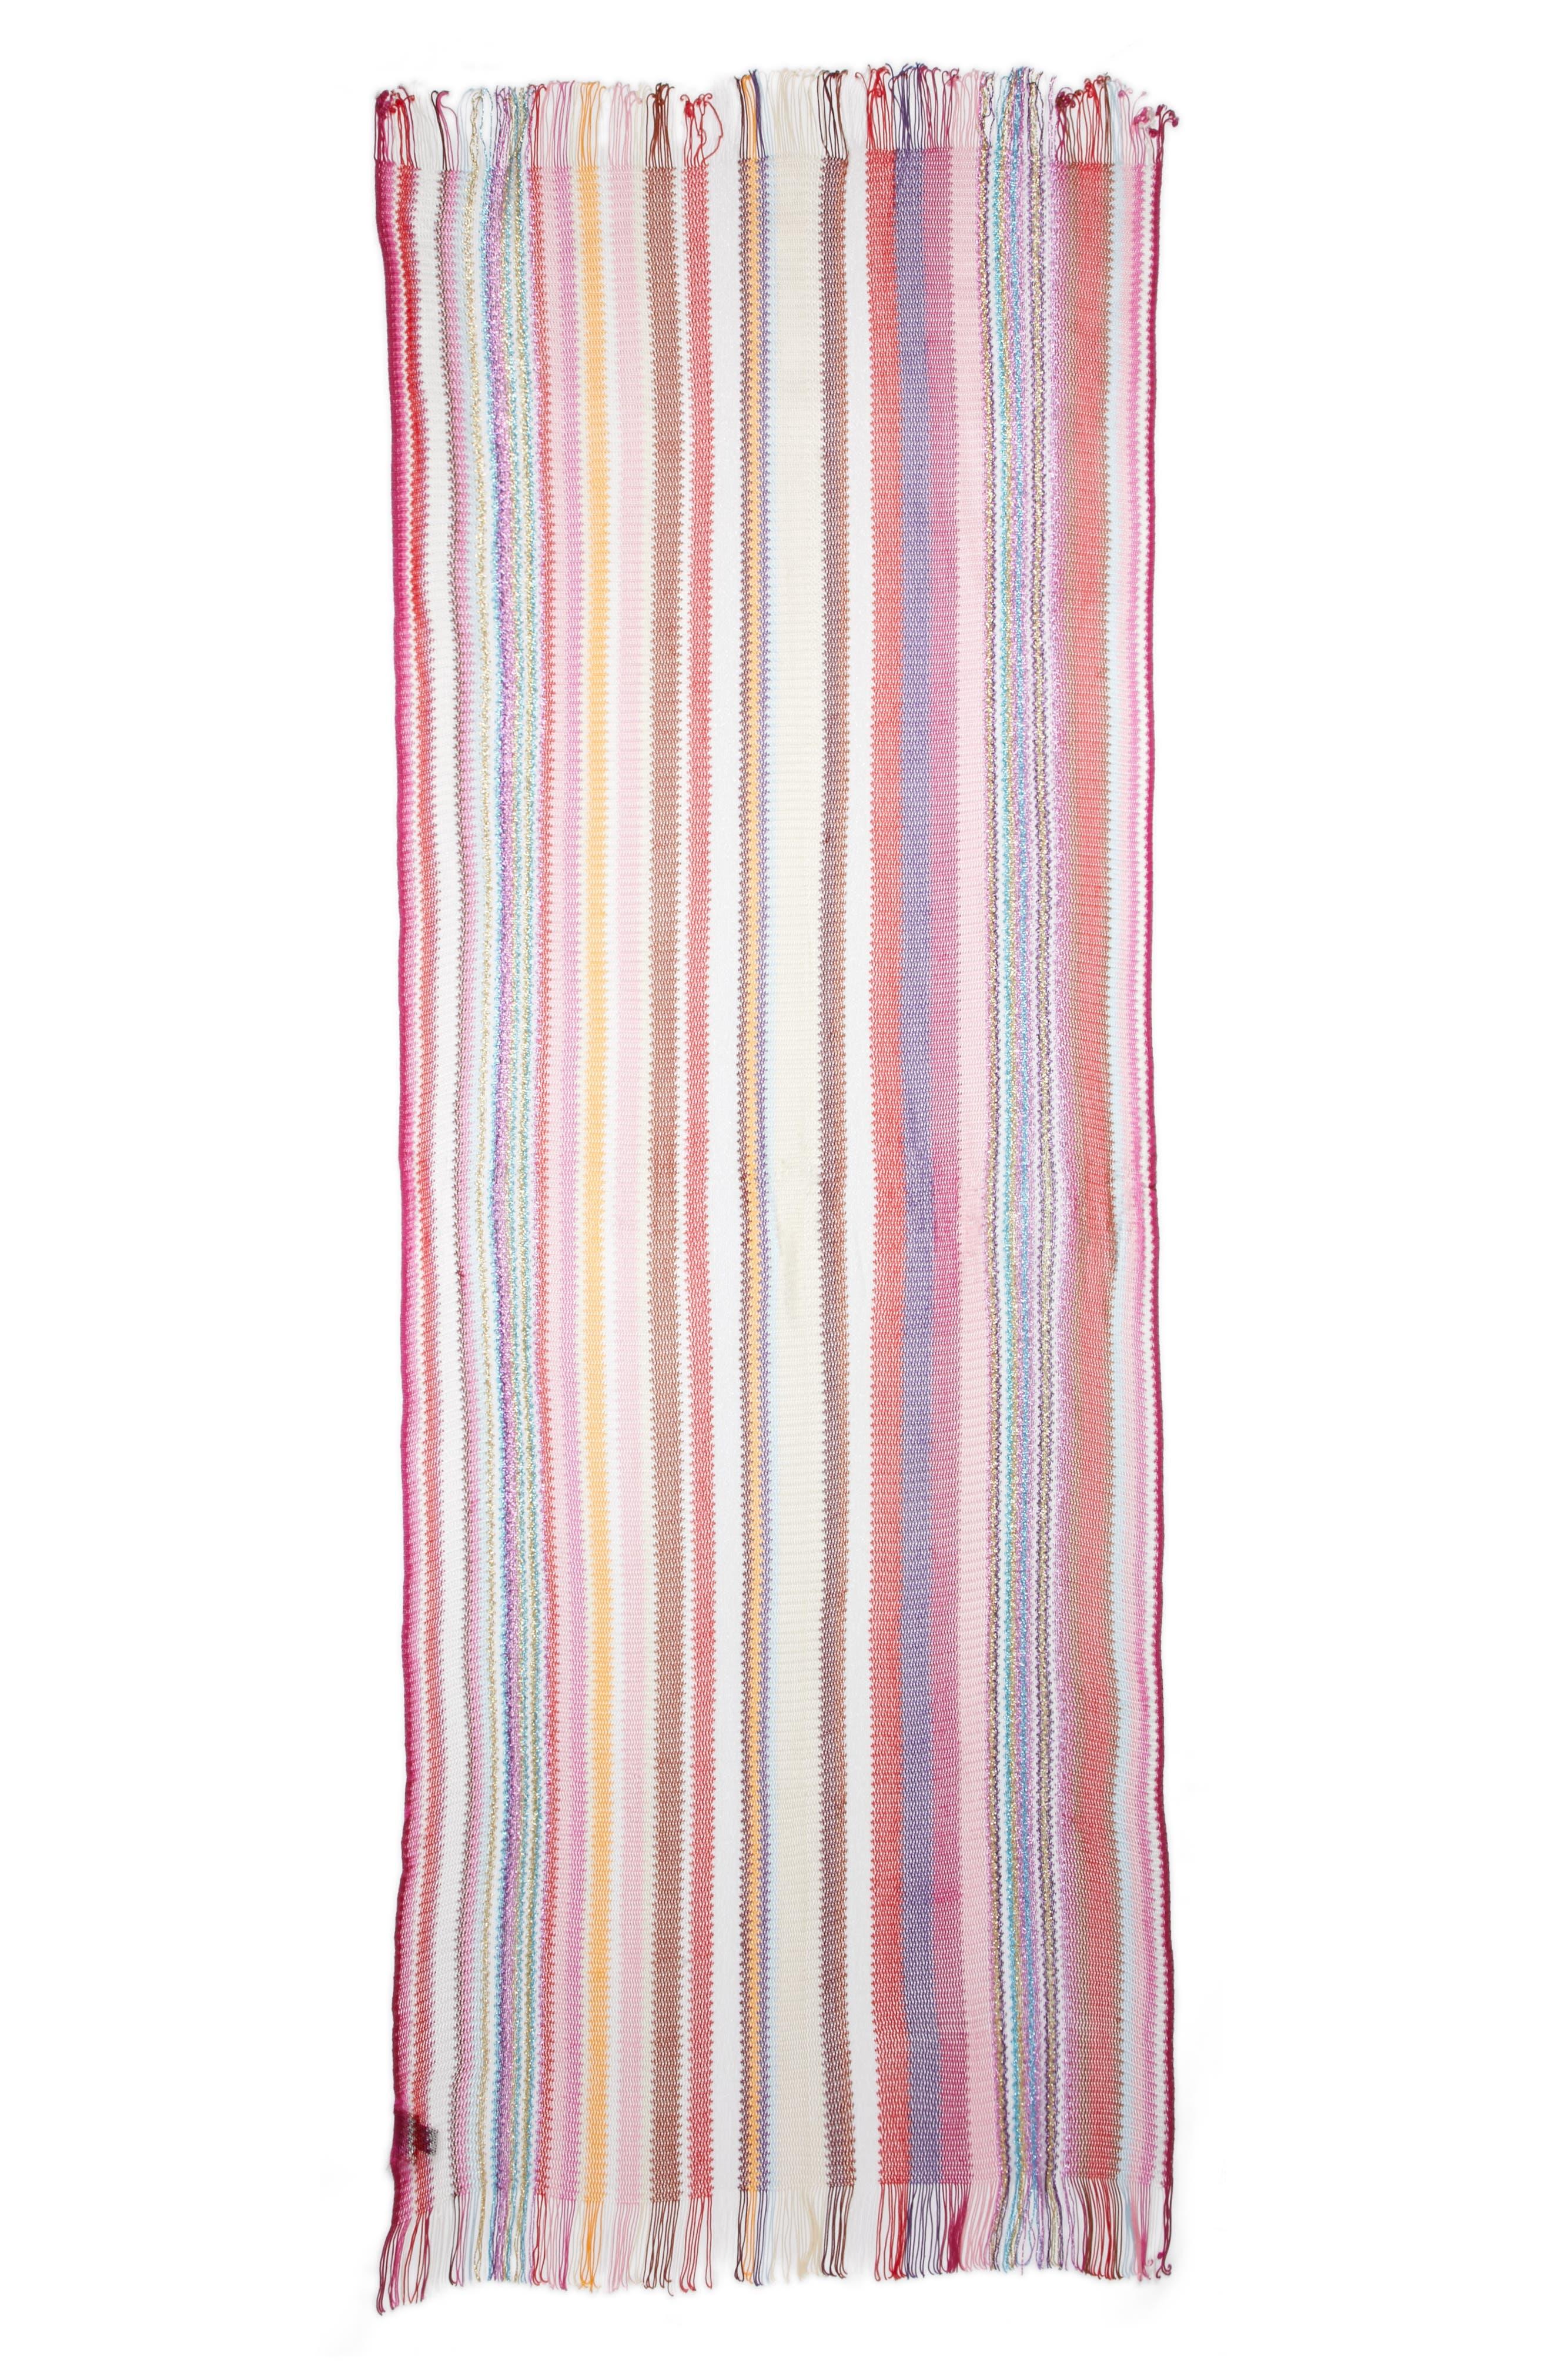 Zigzag Stripe Stole,                             Main thumbnail 1, color,                             Multi Pink